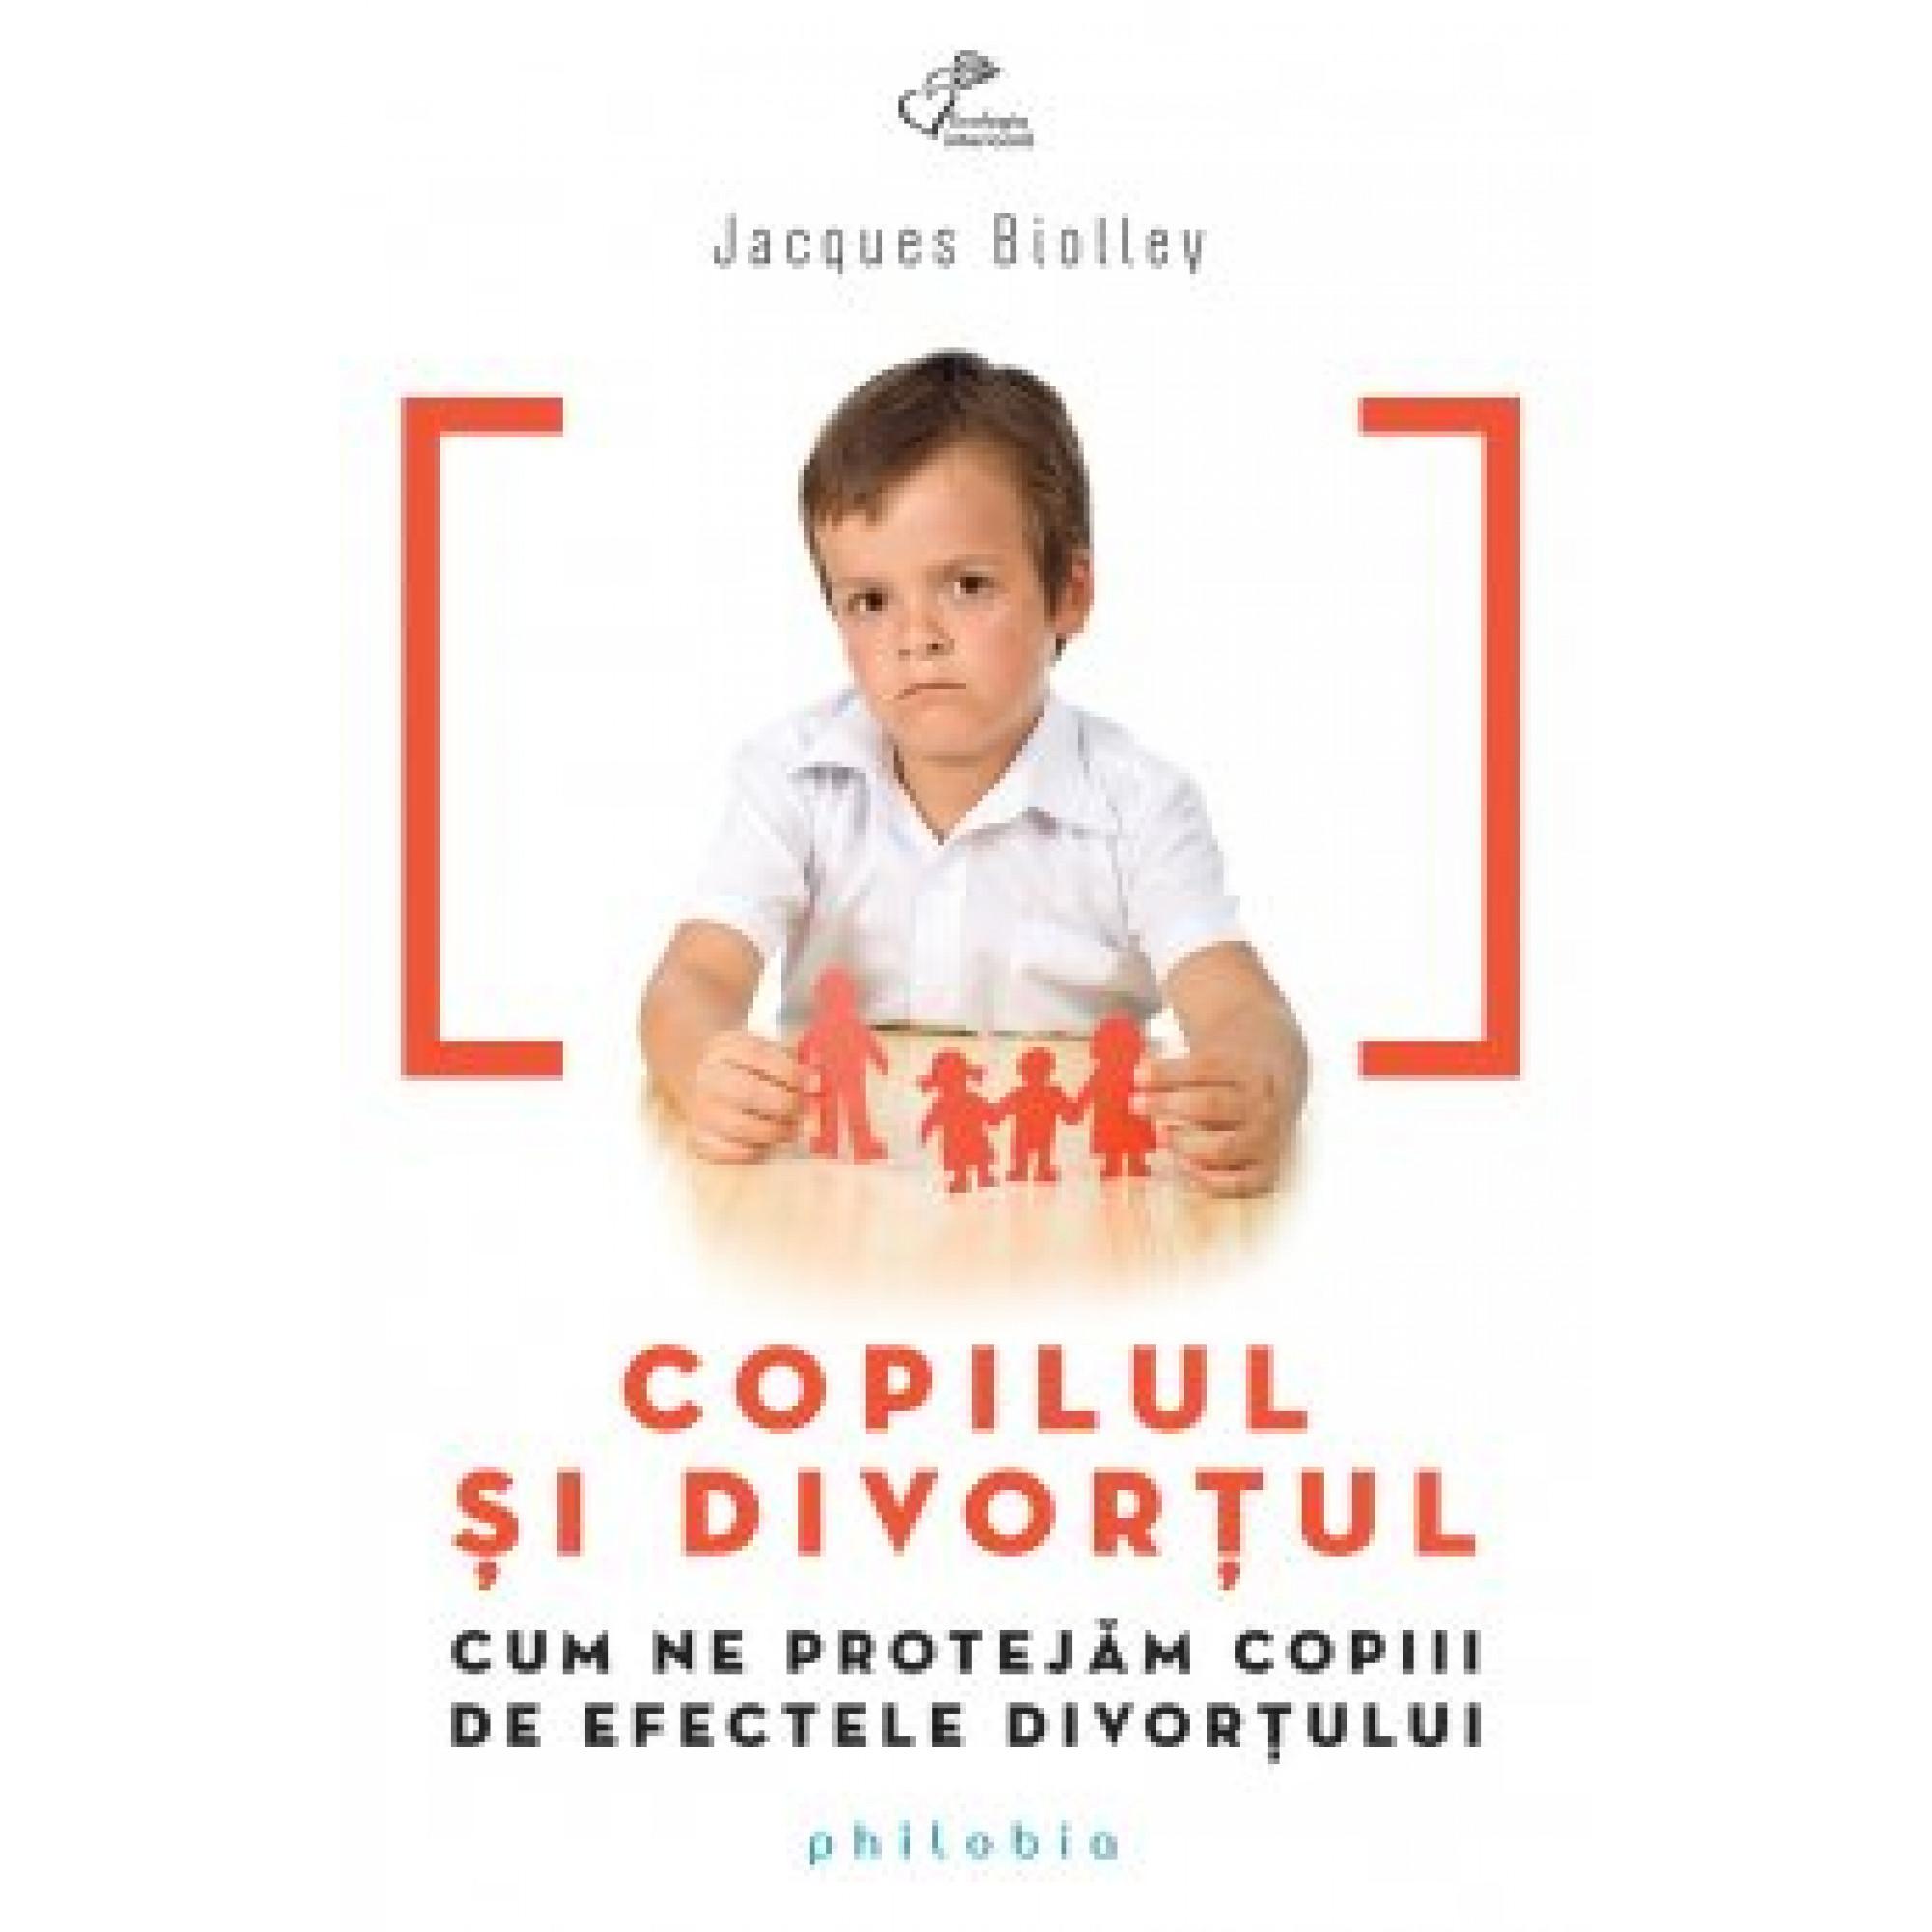 Copilul și divorțul; Jacques Biolley